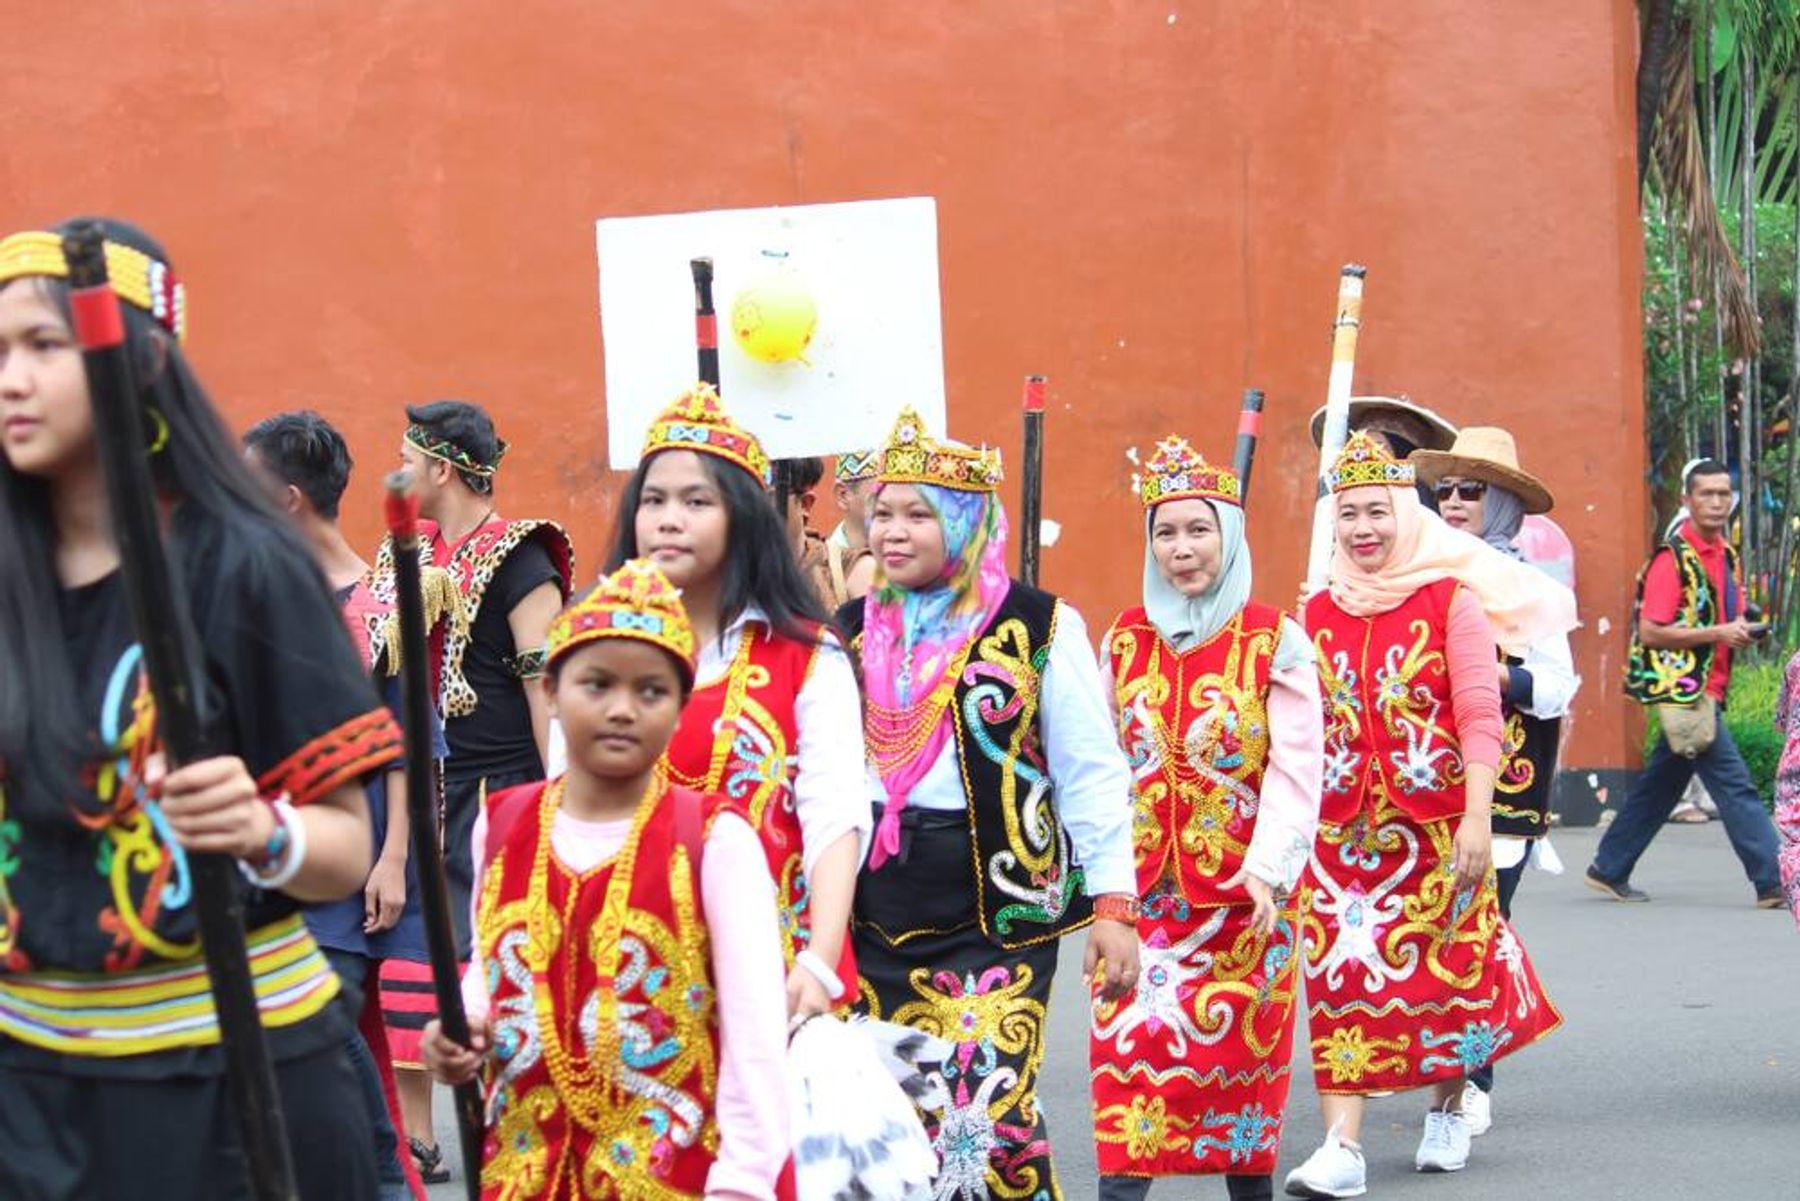 Mengenal Pakaian Adat Kalimantan Utara Warisan Budaya Indonesia